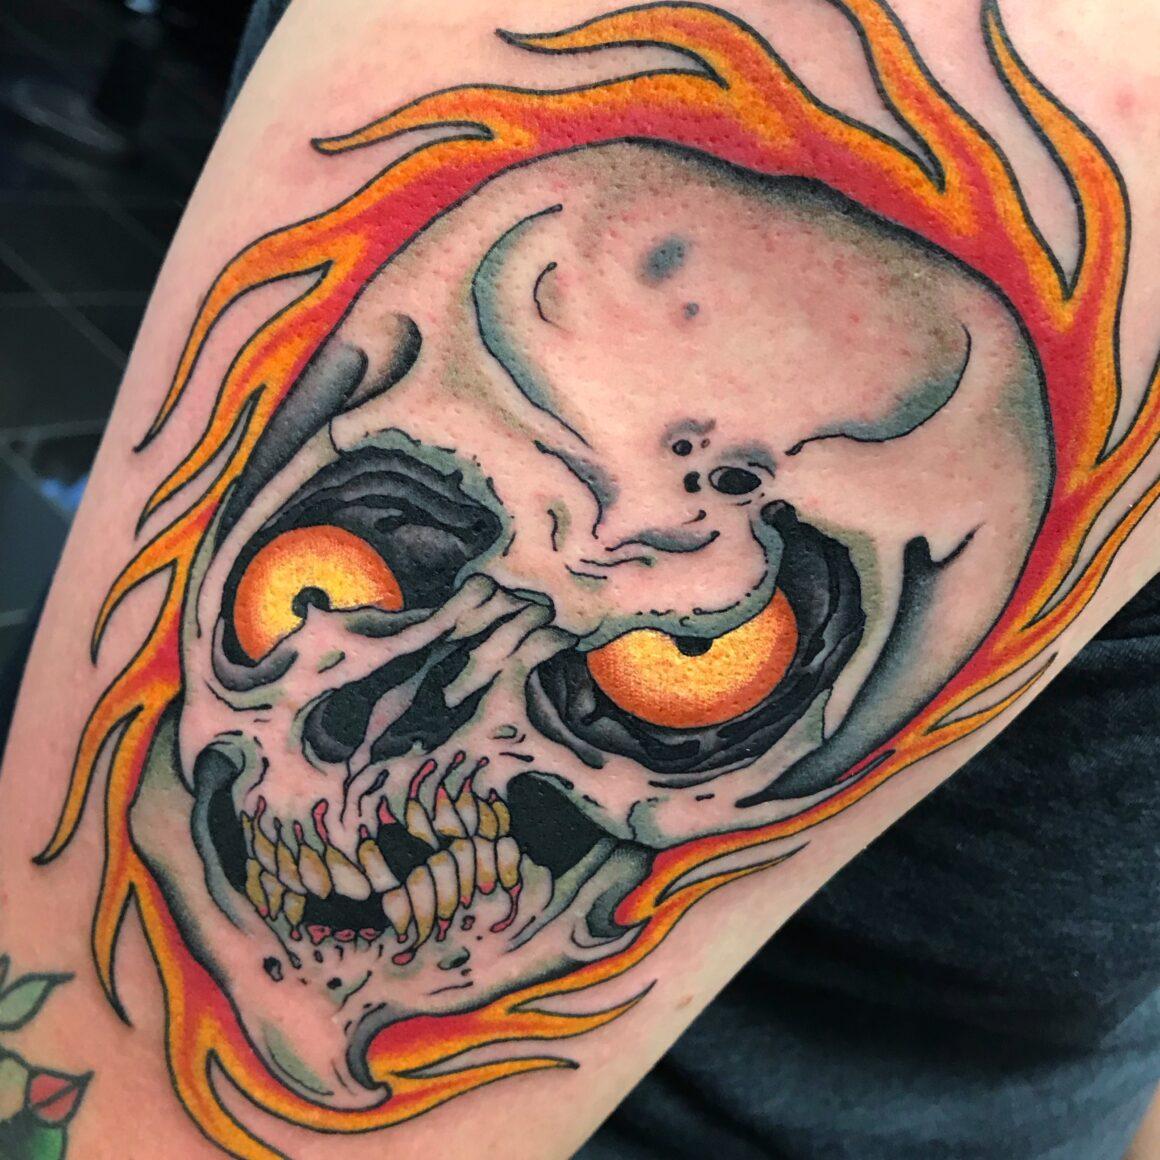 Shaun Topper, Captured Tattoo, Tustin, California